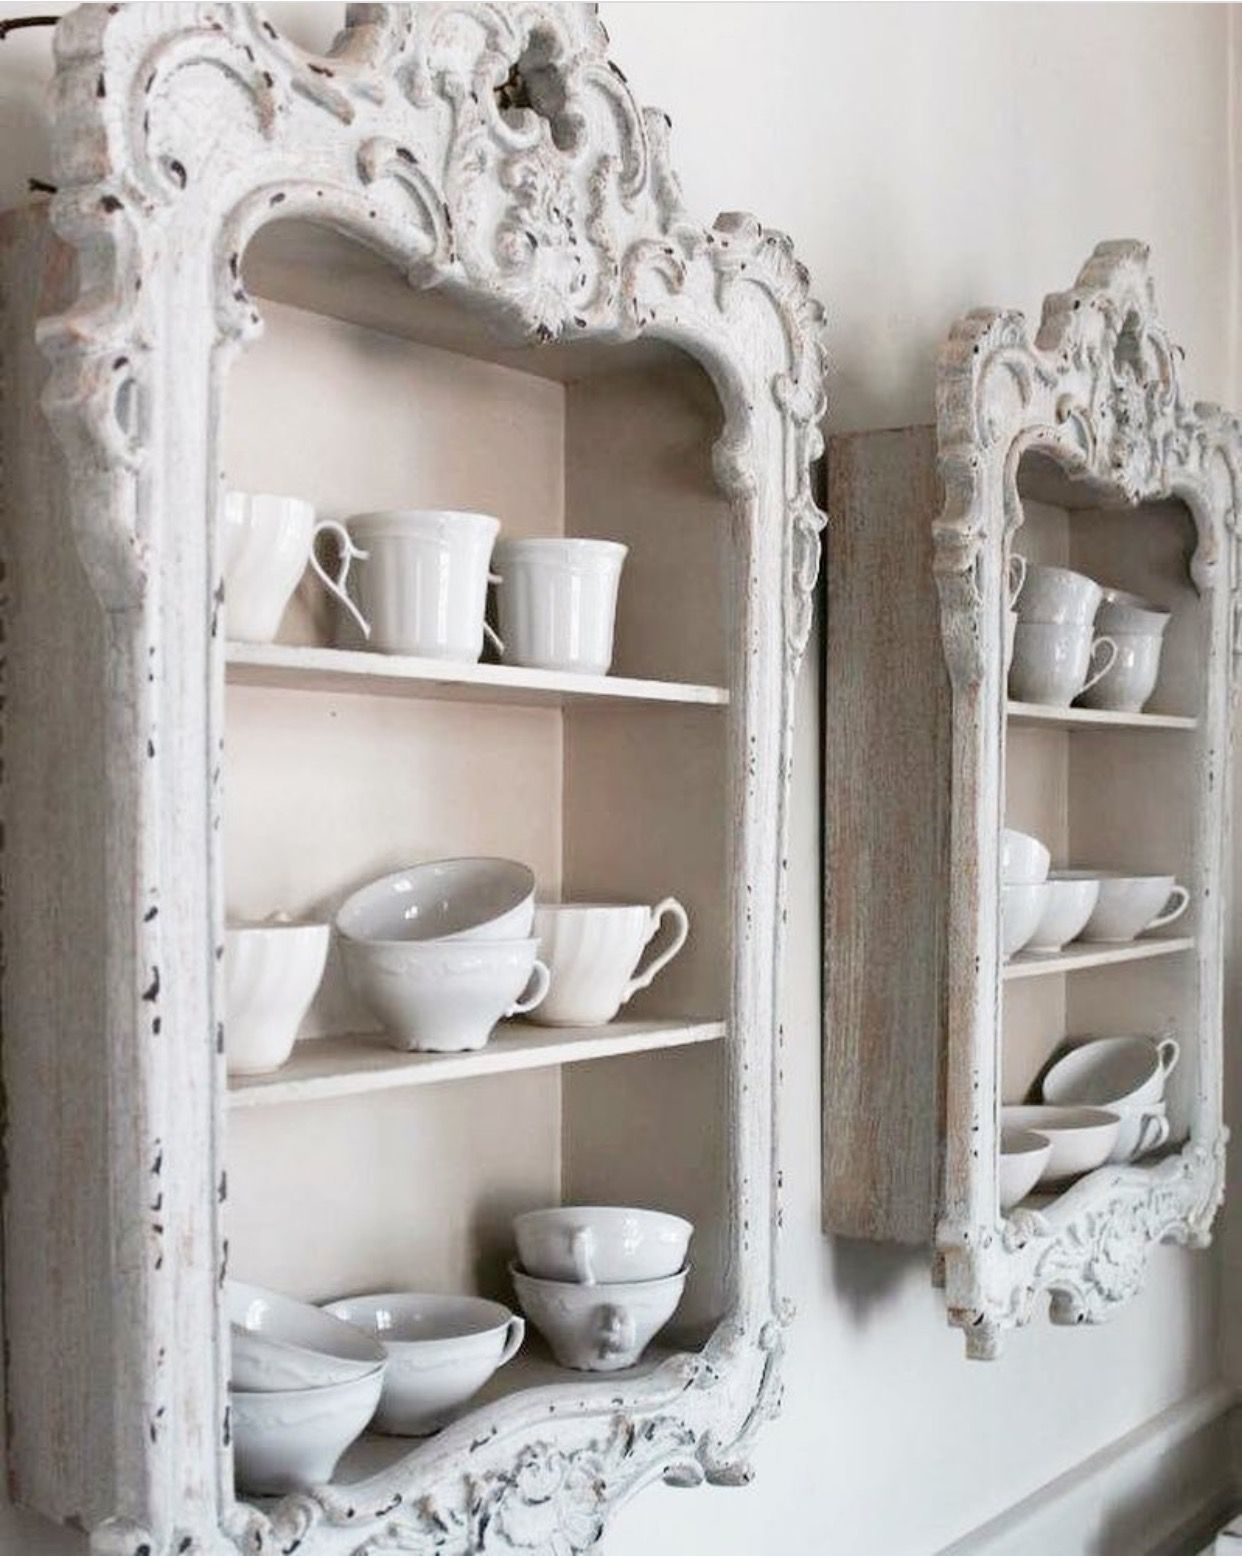 Rustic Wood Medicine Cabinet Medicine Cabinet Rustic Display Cabinet Window Wall Cabinet